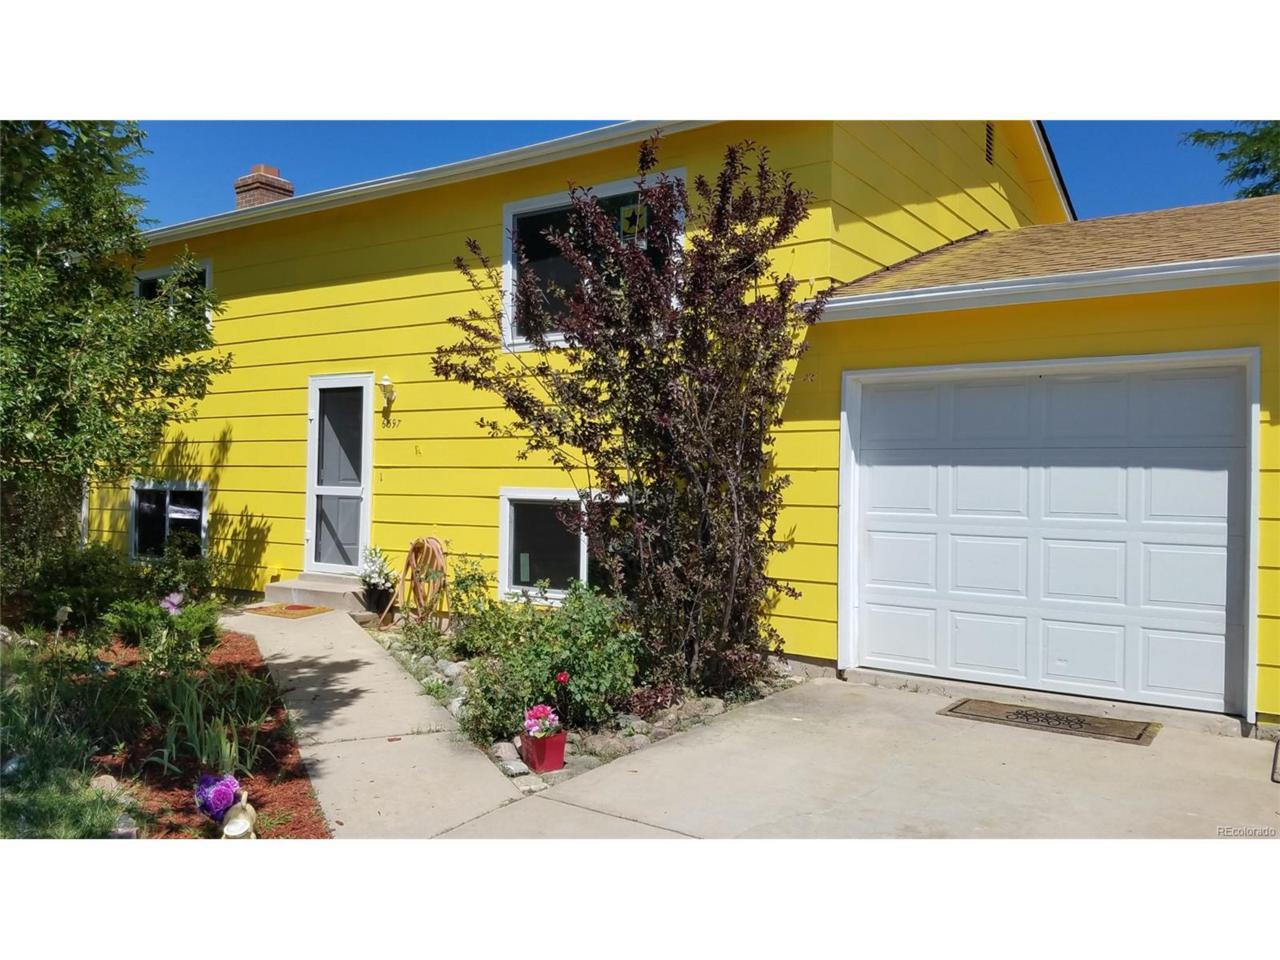 6597 Alcorn Avenue, Parker, CO 80138 (MLS #8929757) :: 8z Real Estate